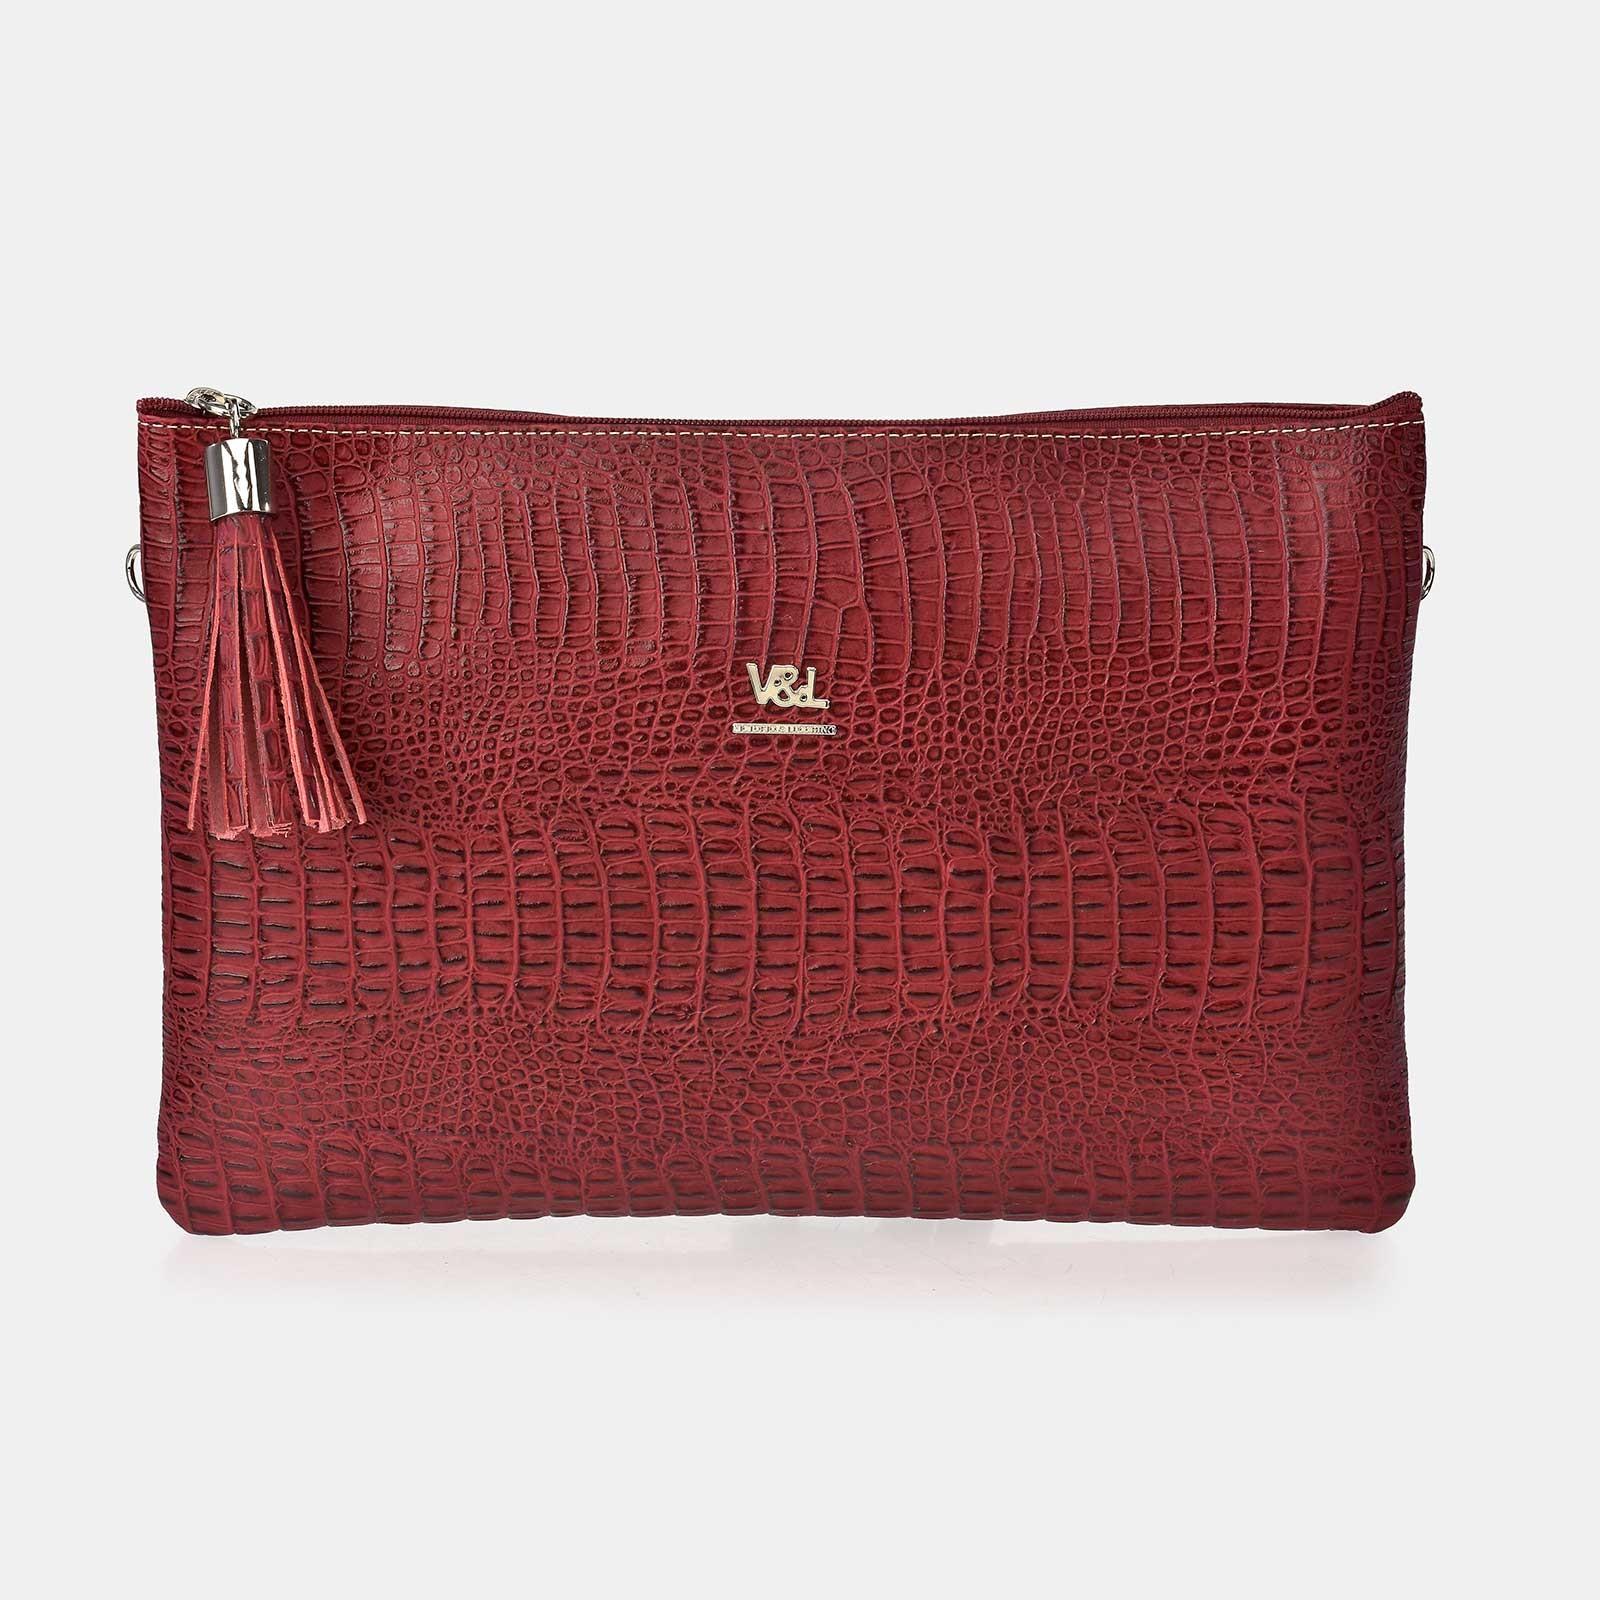 Outlet El Rojo Caballo Bolso De Para Mano 1110 Mujer qB1I1nw8